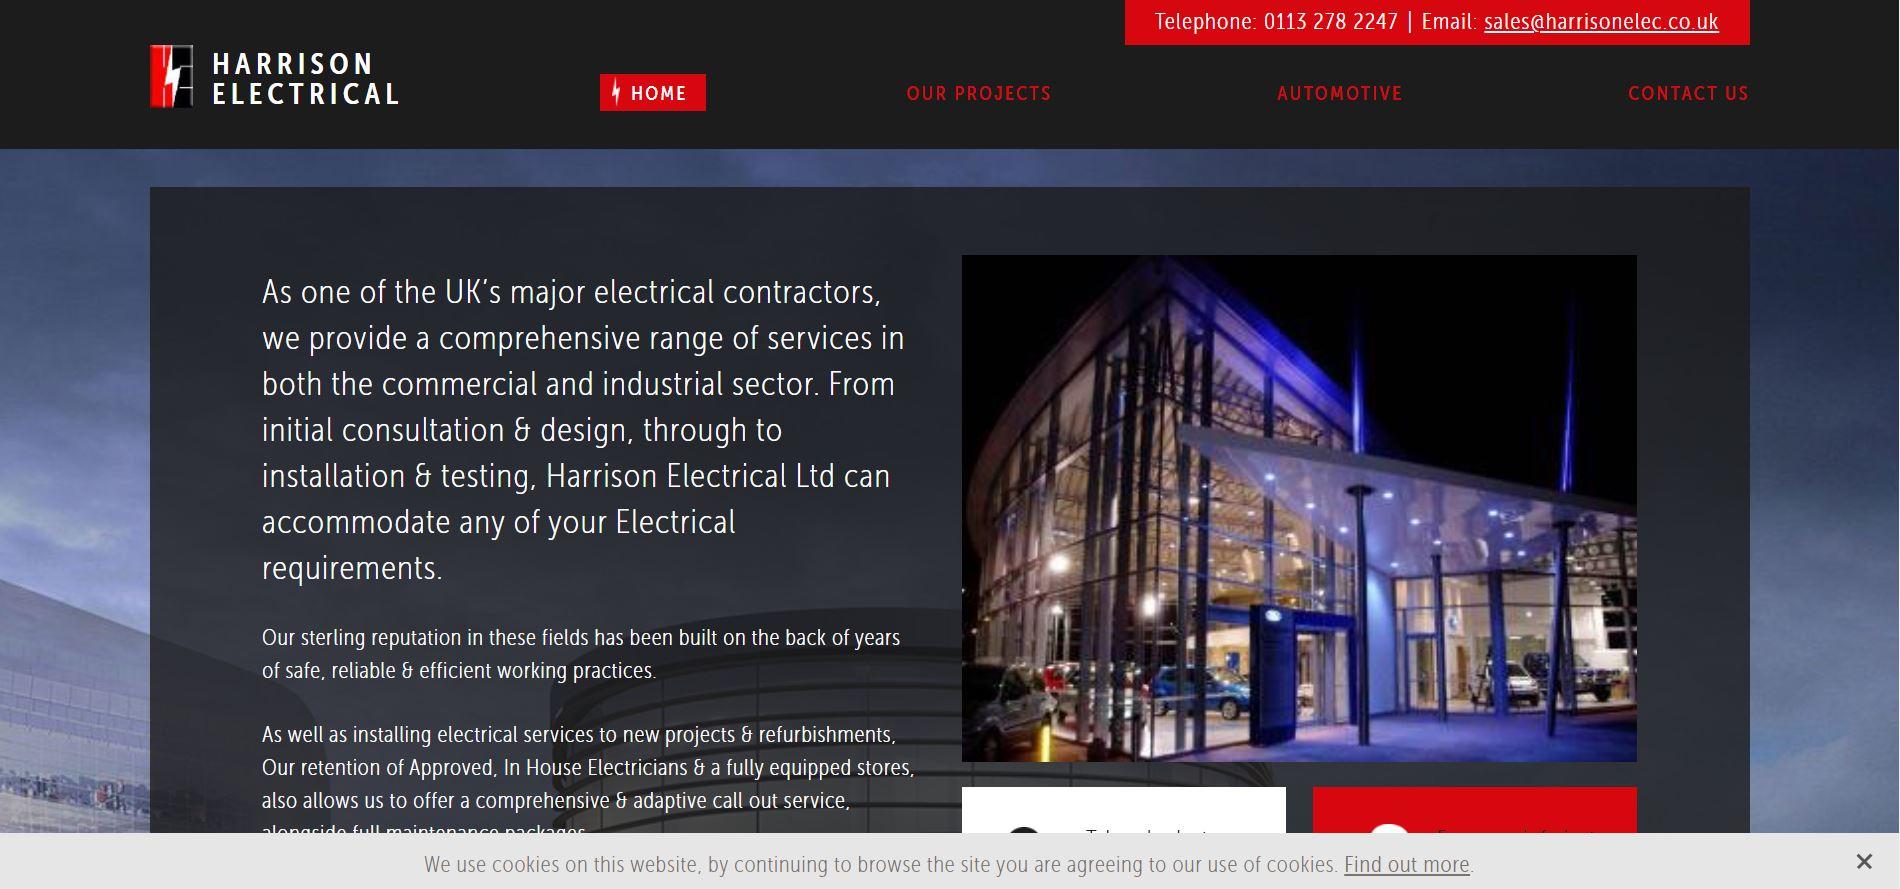 Harrison Electrical